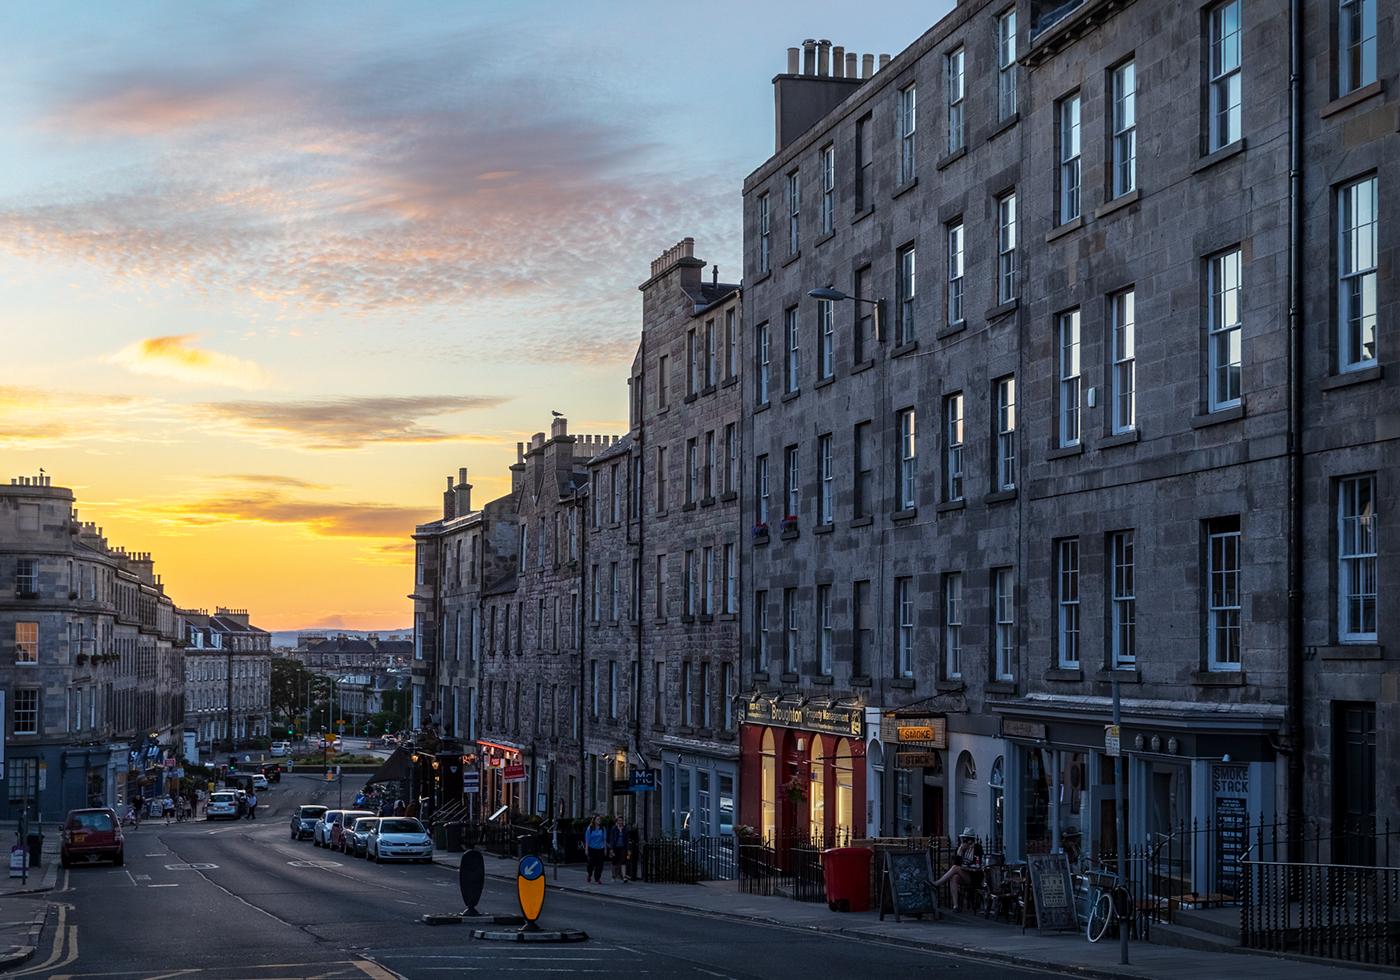 Gloaming street, Edinburgh, Scotland